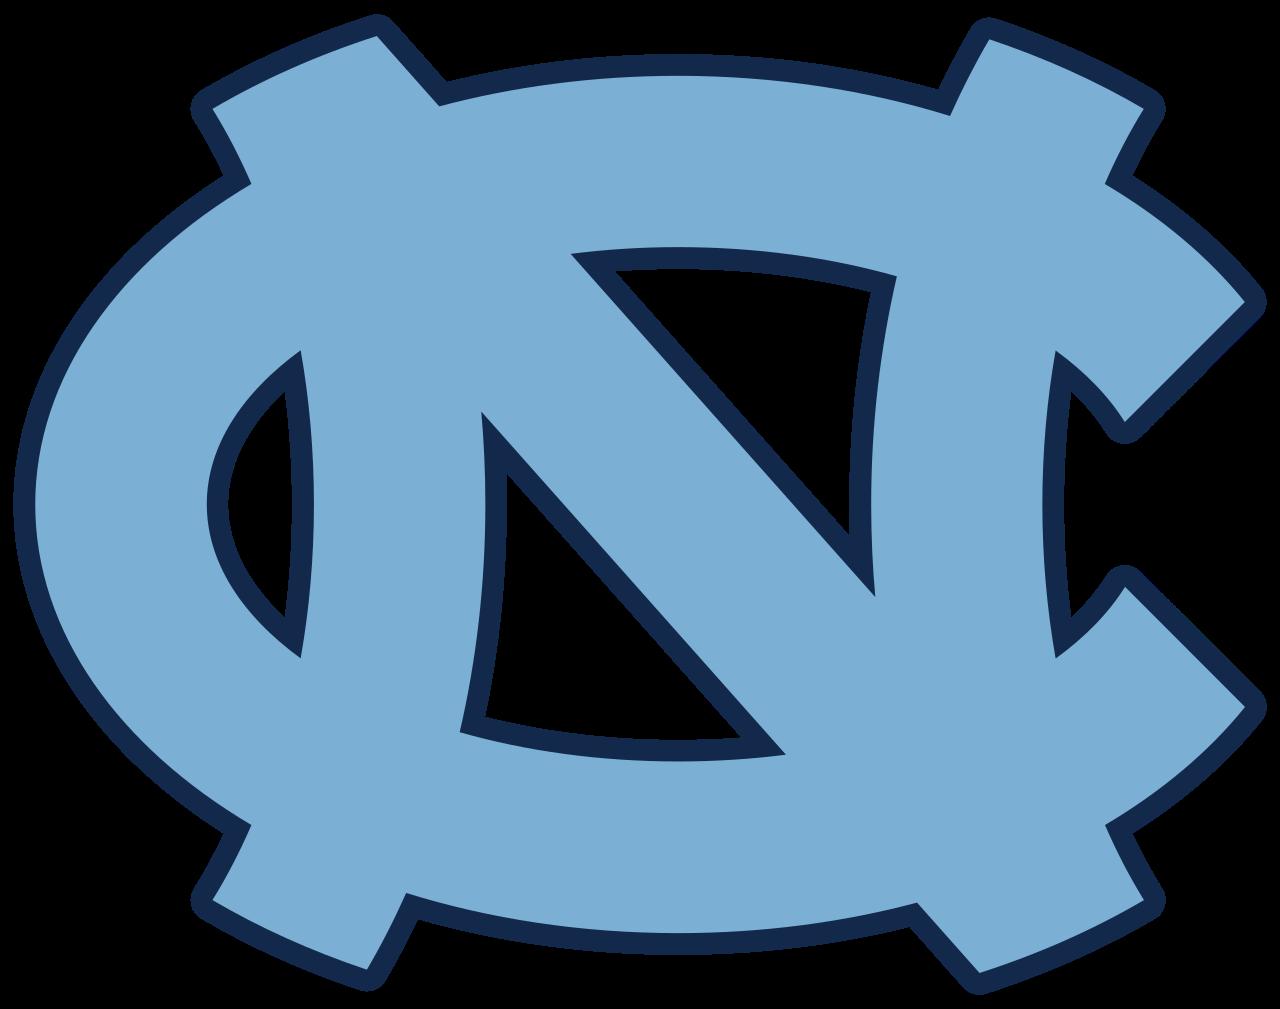 North carolina tar logo. Heels clipart file